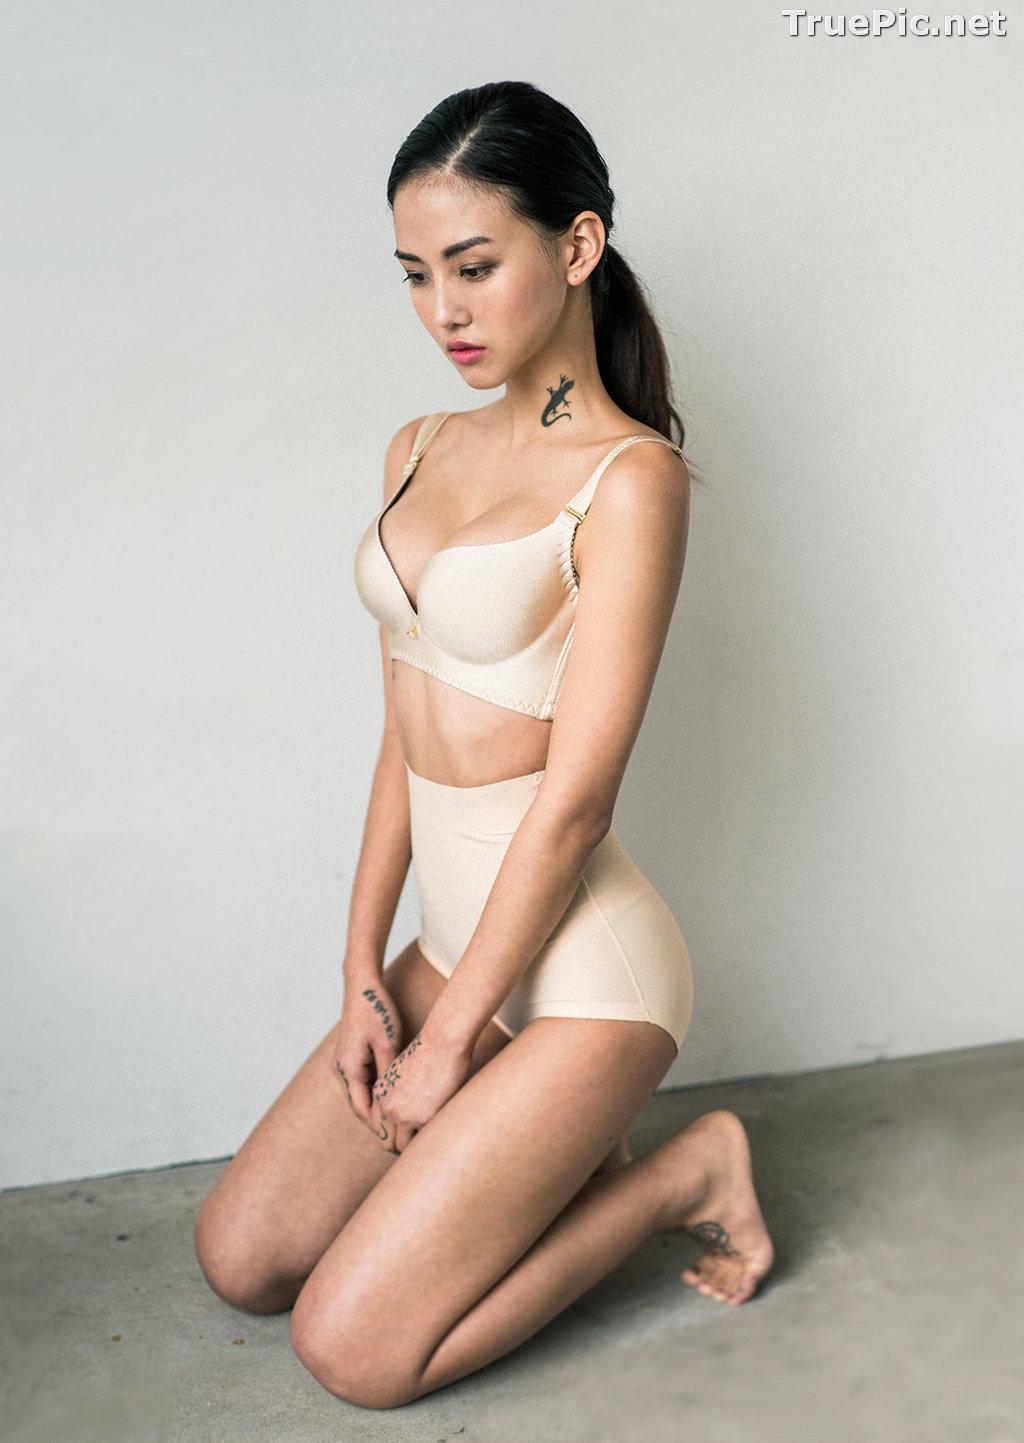 Image Korean Fashion Model – Baek Ye Jin – Sexy Lingerie Collection #5 - TruePic.net - Picture-1